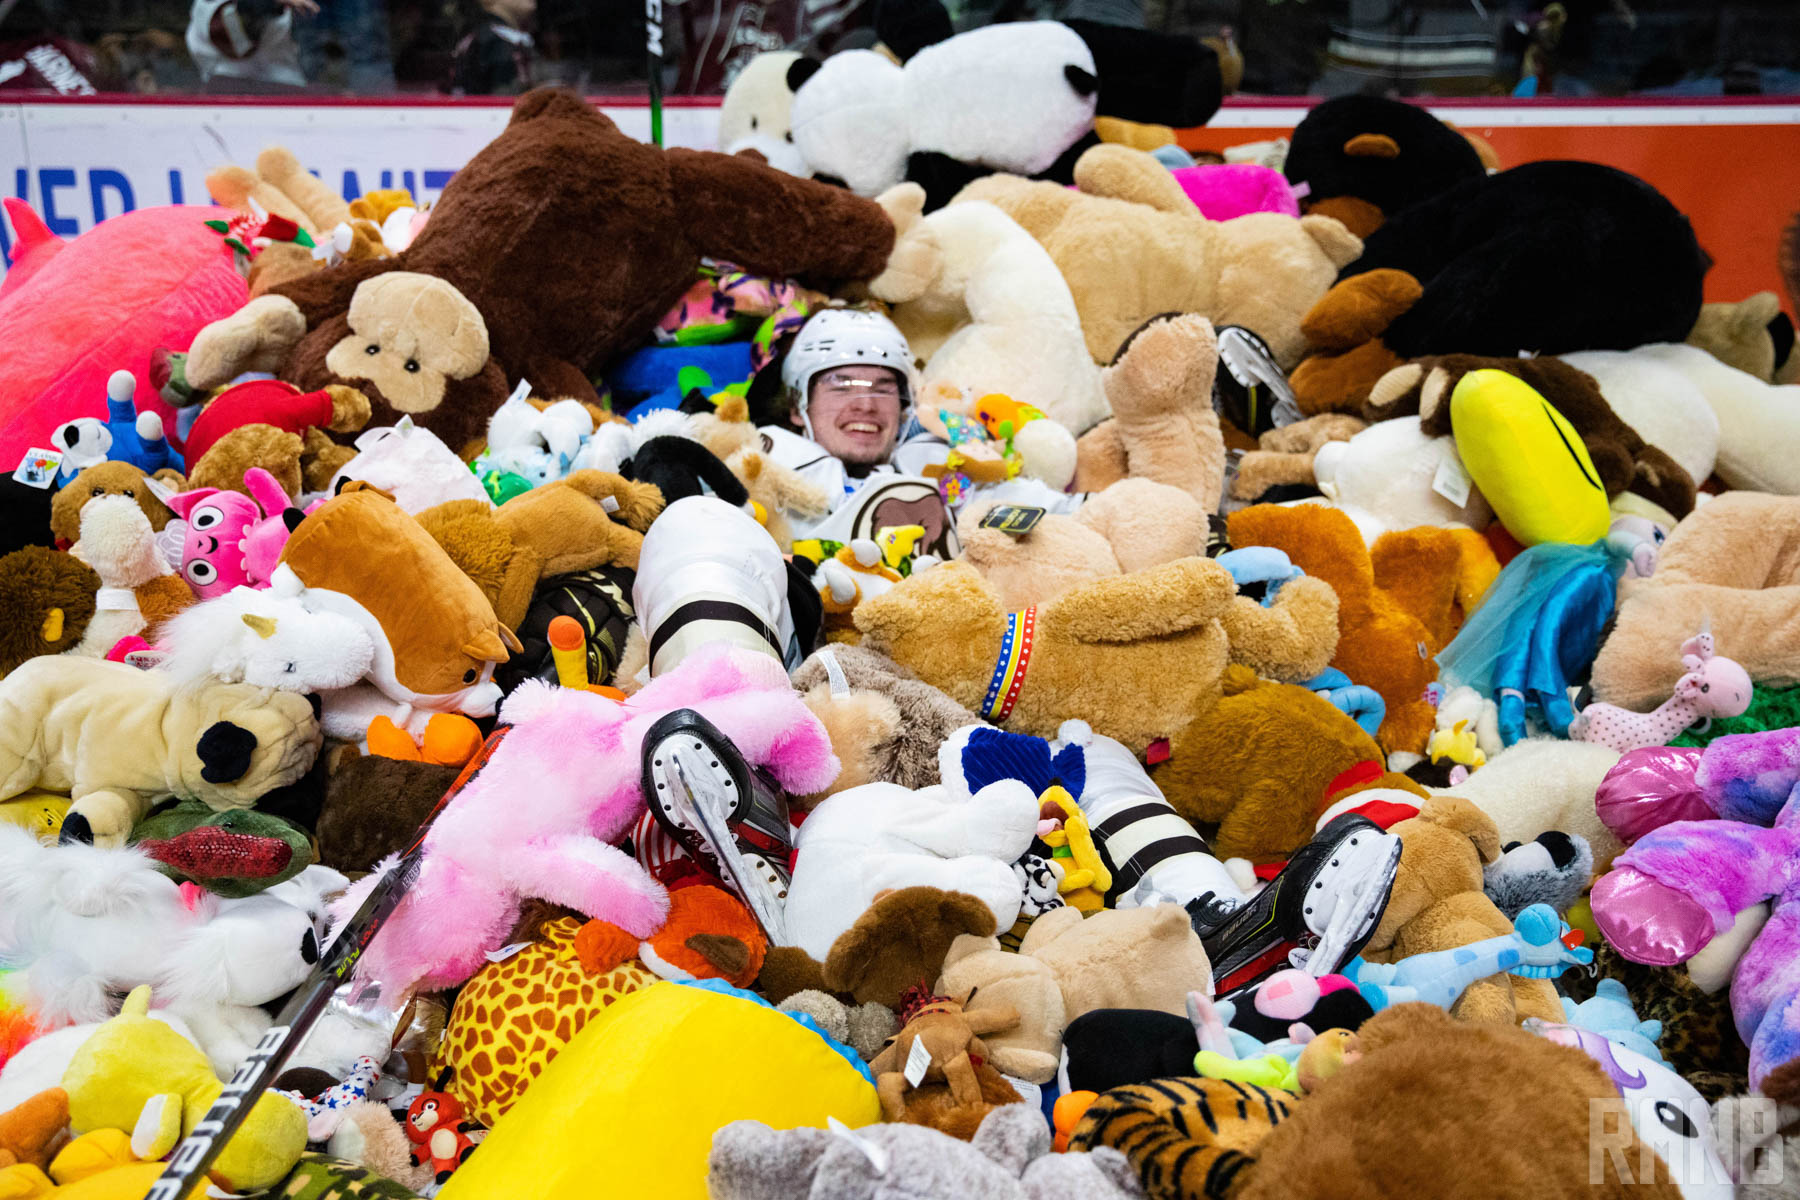 https://i2.wp.com/russianmachineneverbreaks.com/wp-content/uploads/2019/12/hershey-bears-teddy-bear-toss-1673-alex-alexeyev.jpg?resize=1800%2C1200&ssl=1